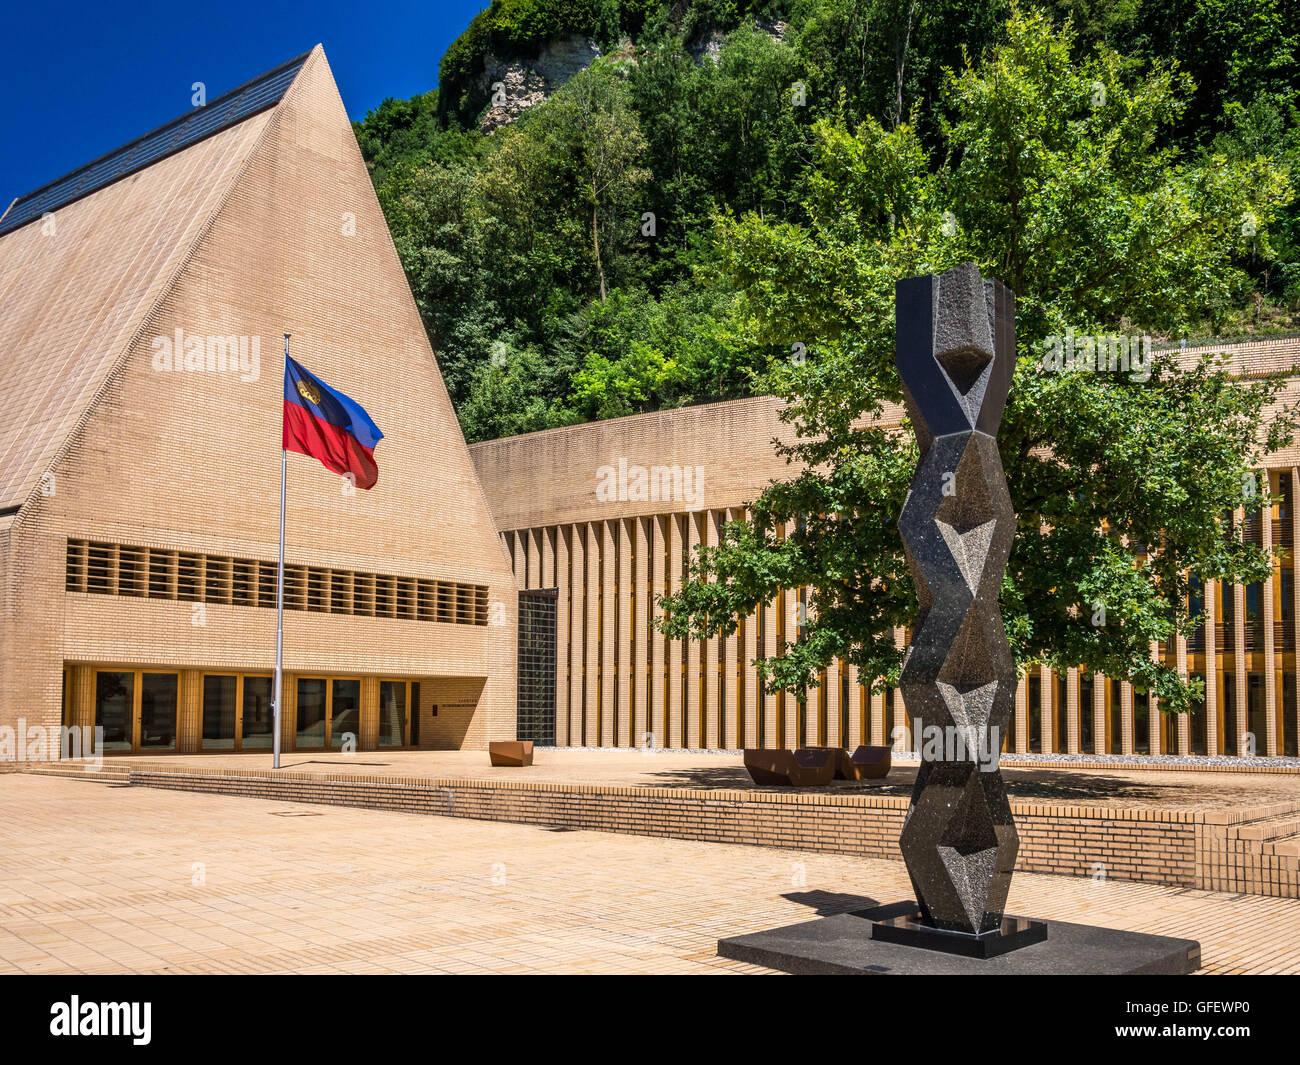 Parliament and government buildings, Vaduz, Principality of Liechtenstein, Europe Stock Photo